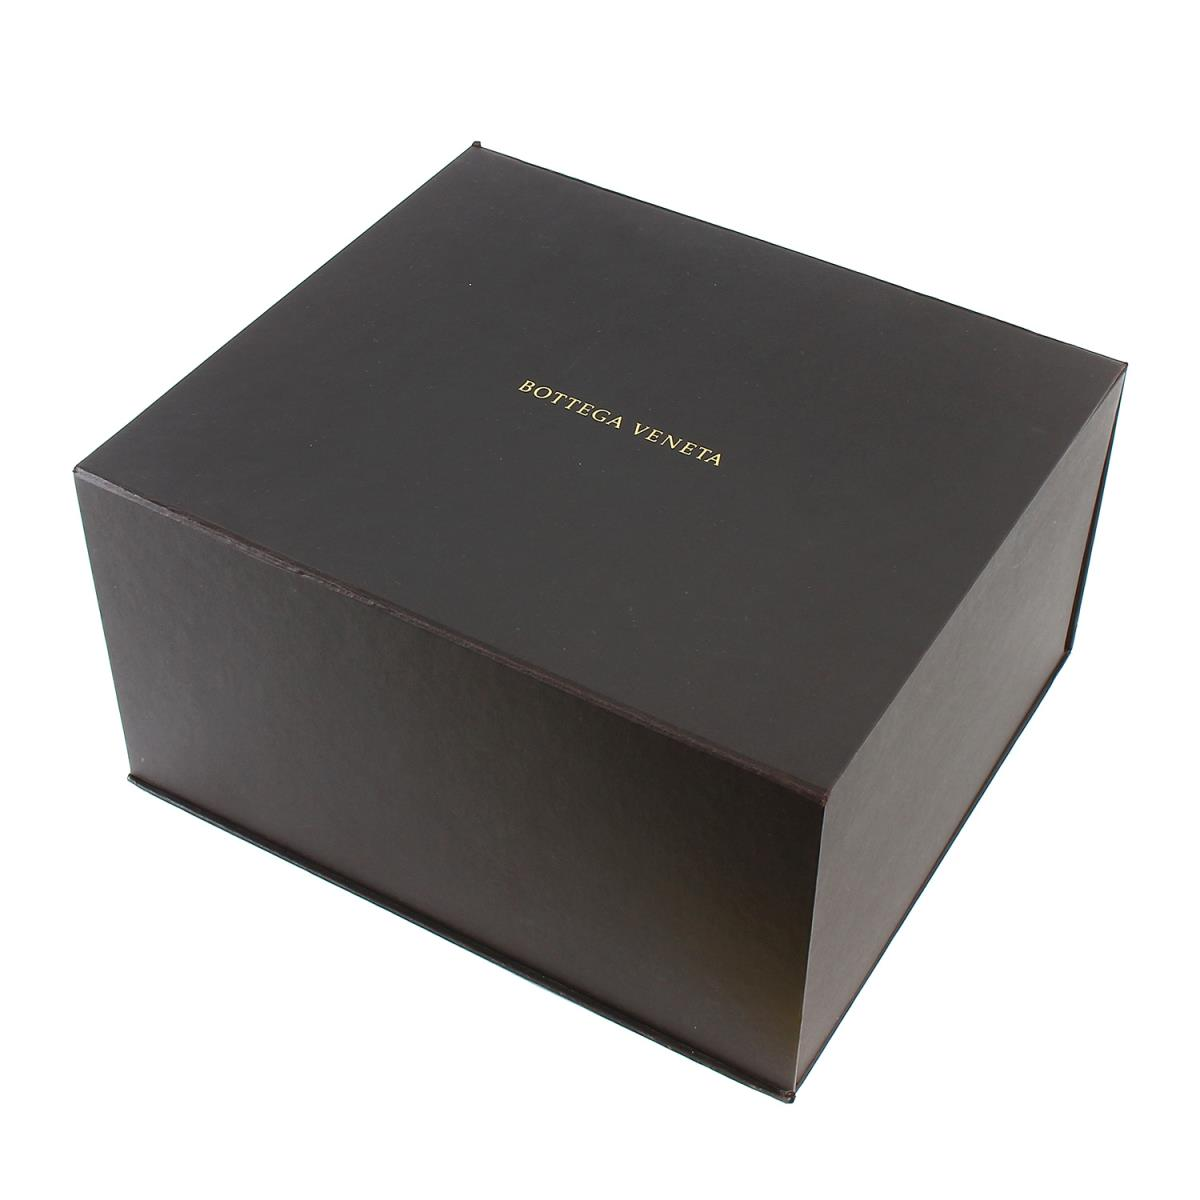 BOTTEGA VENETAボッテガヴェネタイントレチャート レザーセカンドバッグ イタリア製 クラッチバッグ ブラックメンズK2318あす楽 対応可QCoeBrdWx